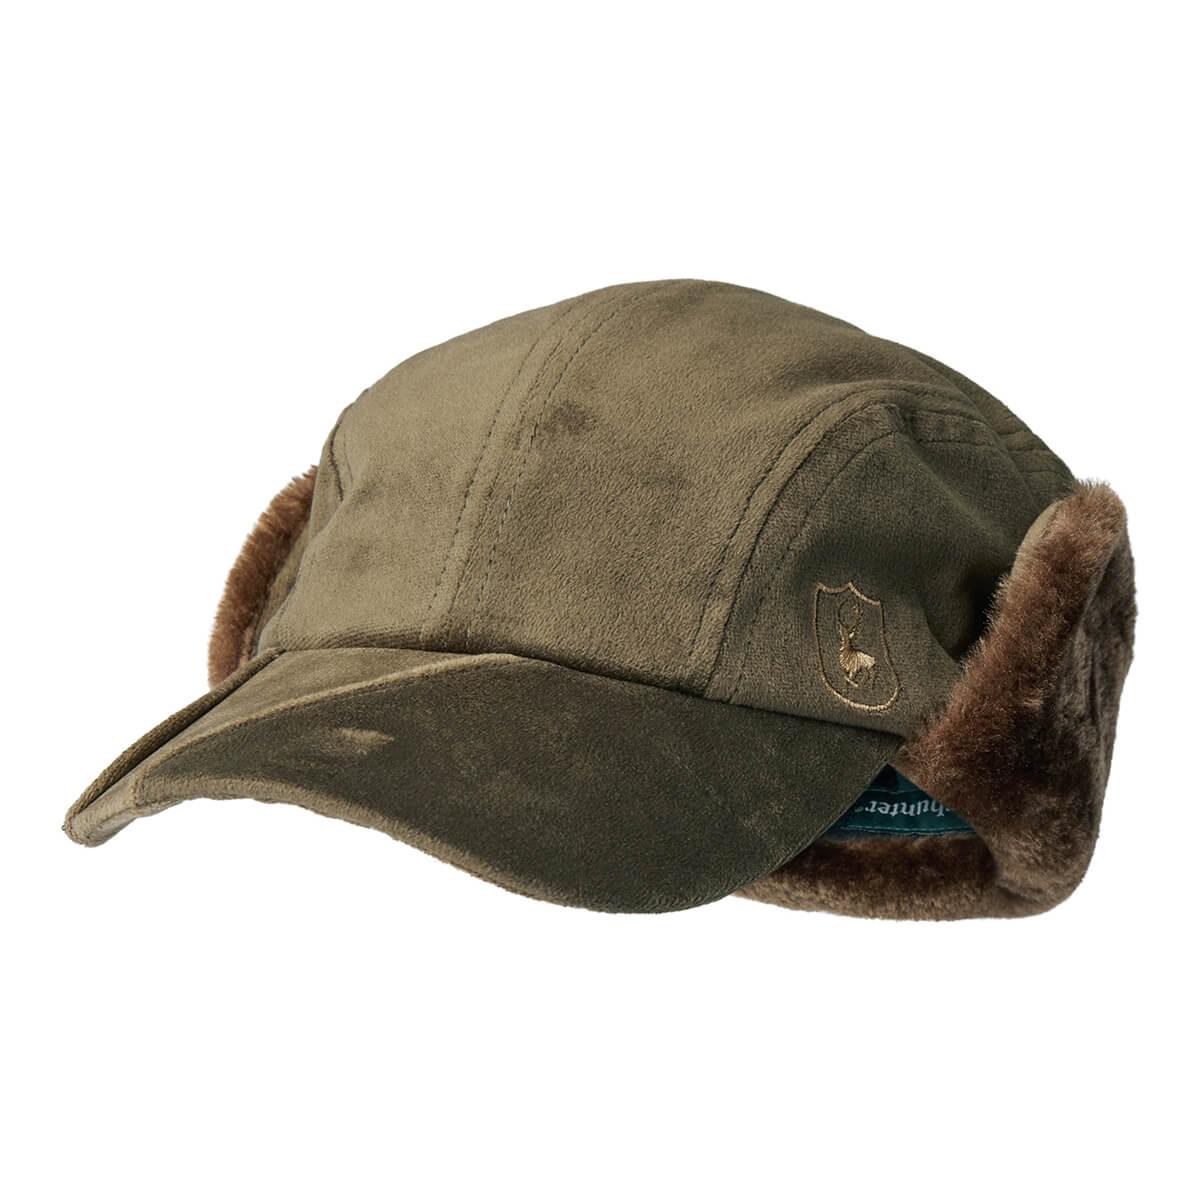 Deerhunter Mütze Rusky Silent - Mützen & Caps